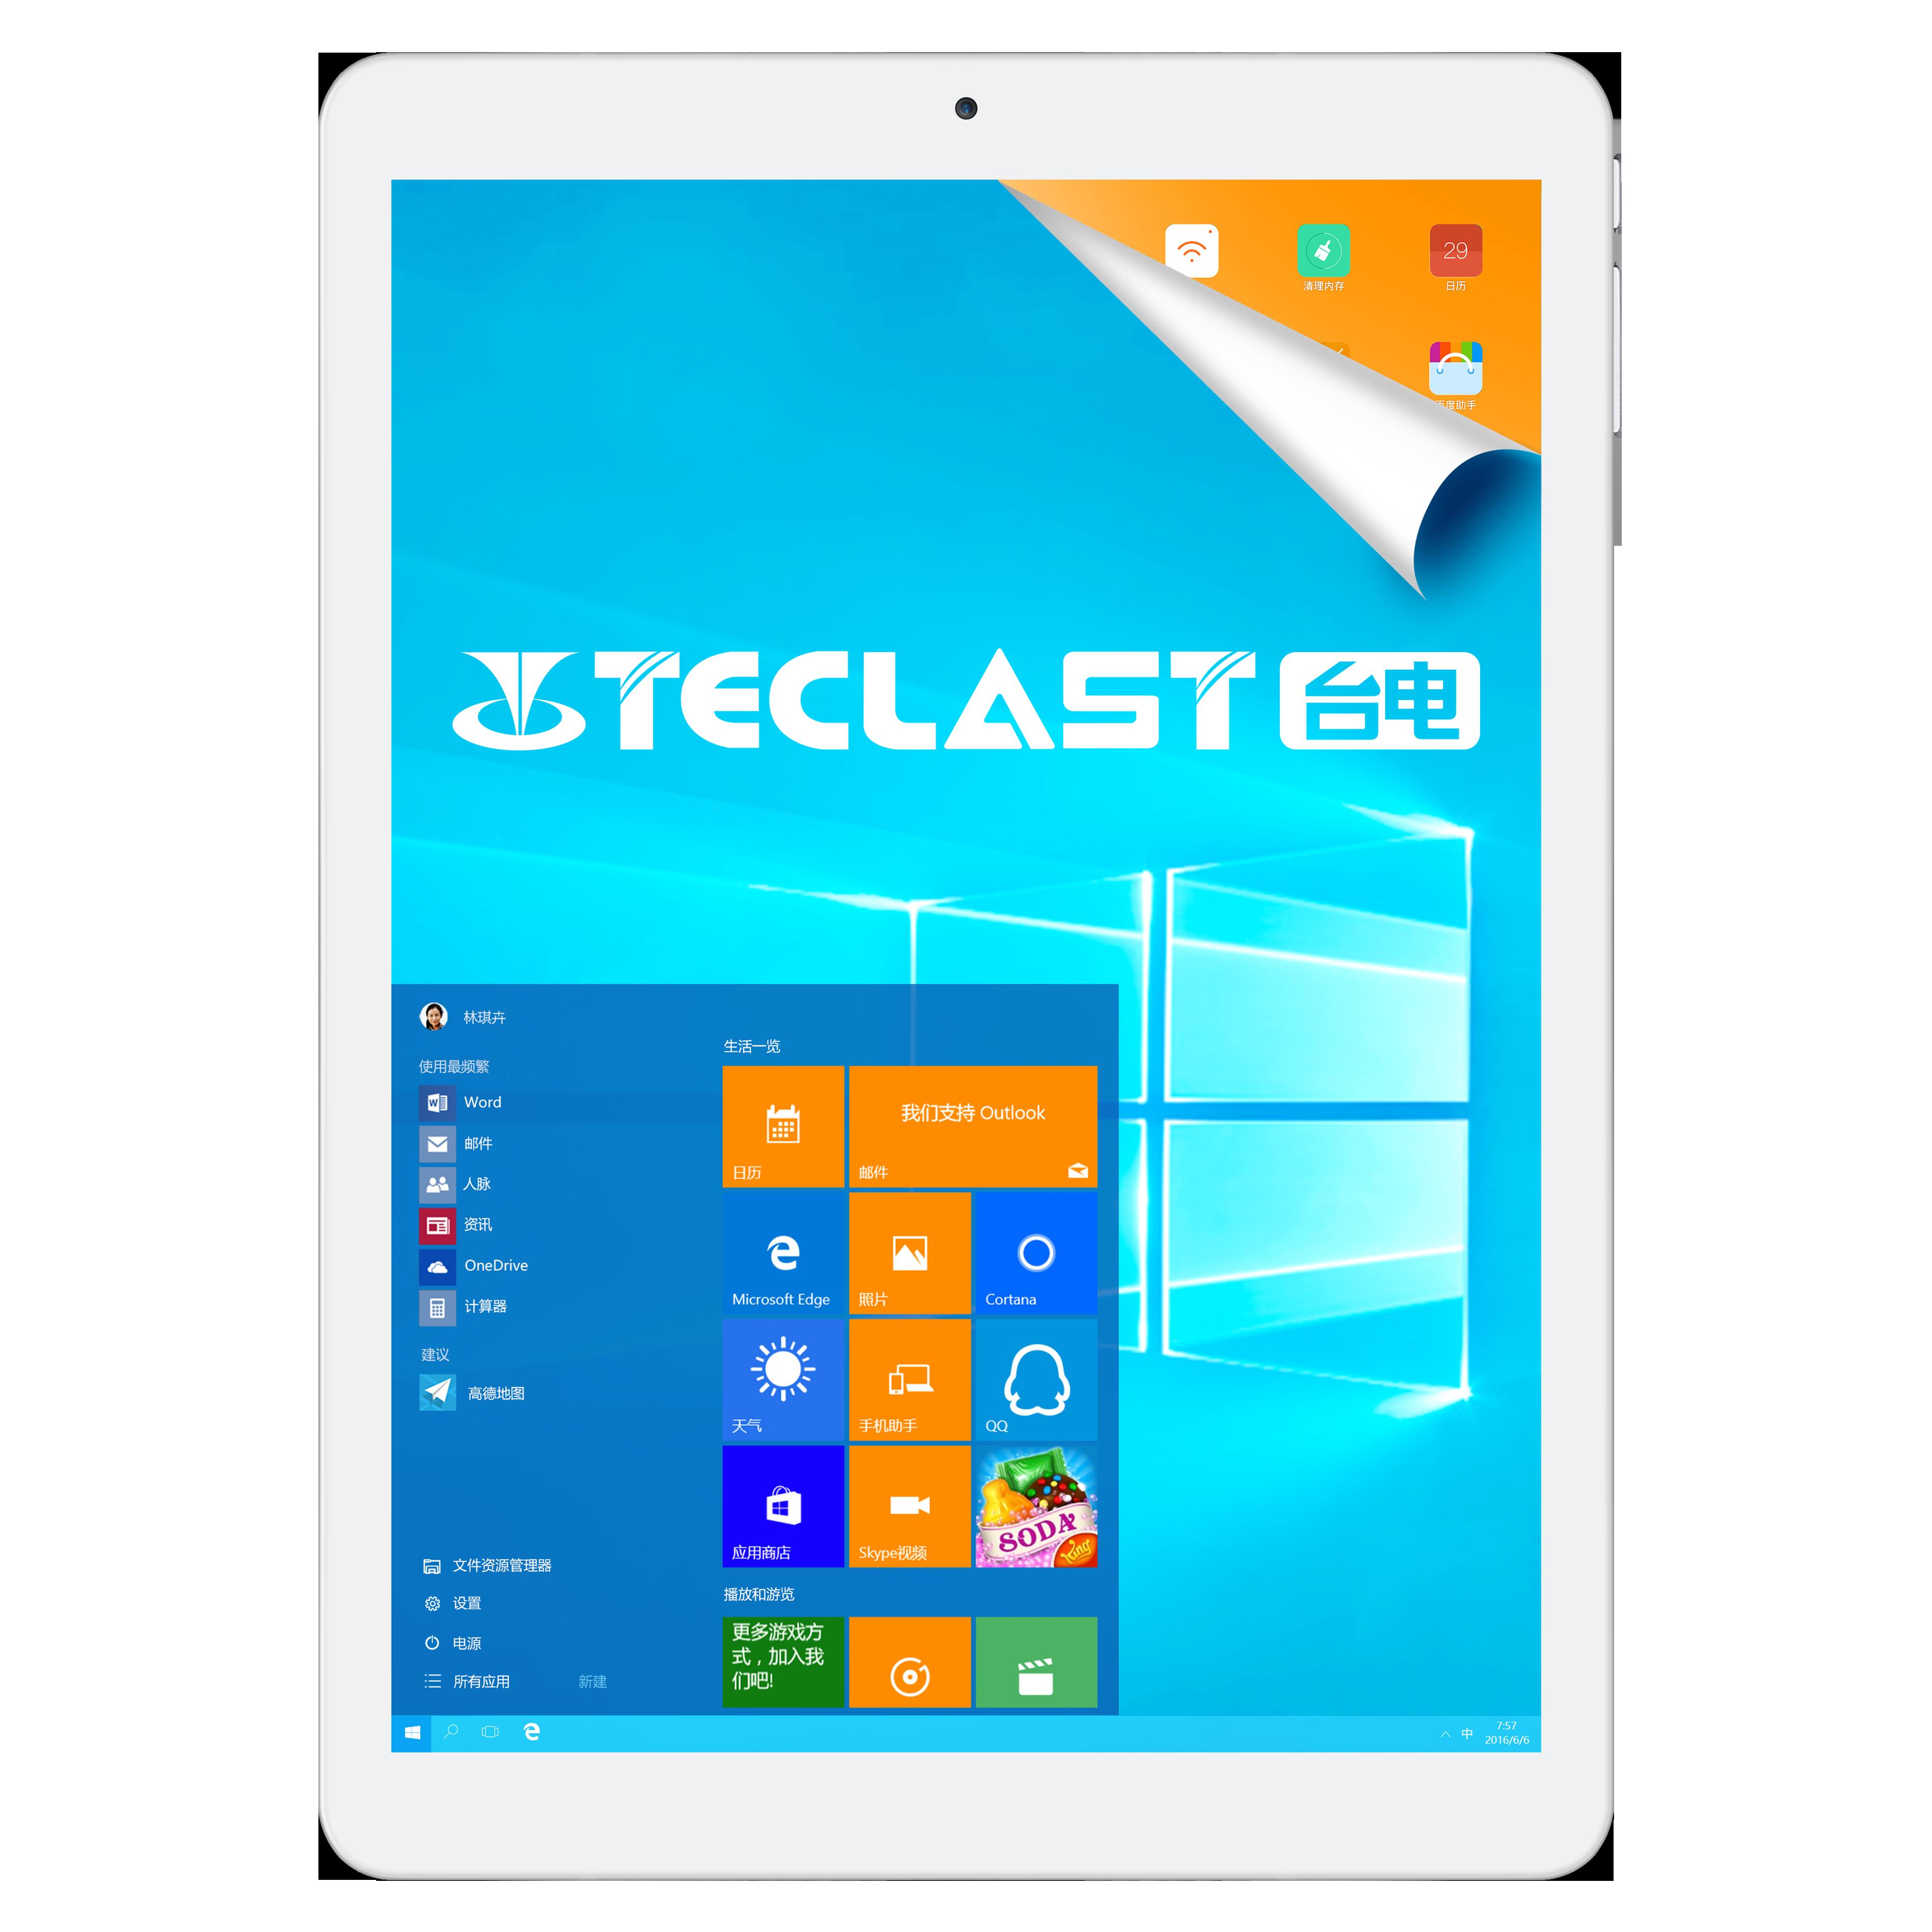 Teclast/台电 X98 Plus II双系统 WIFI 64GB Win10平板电脑英寸